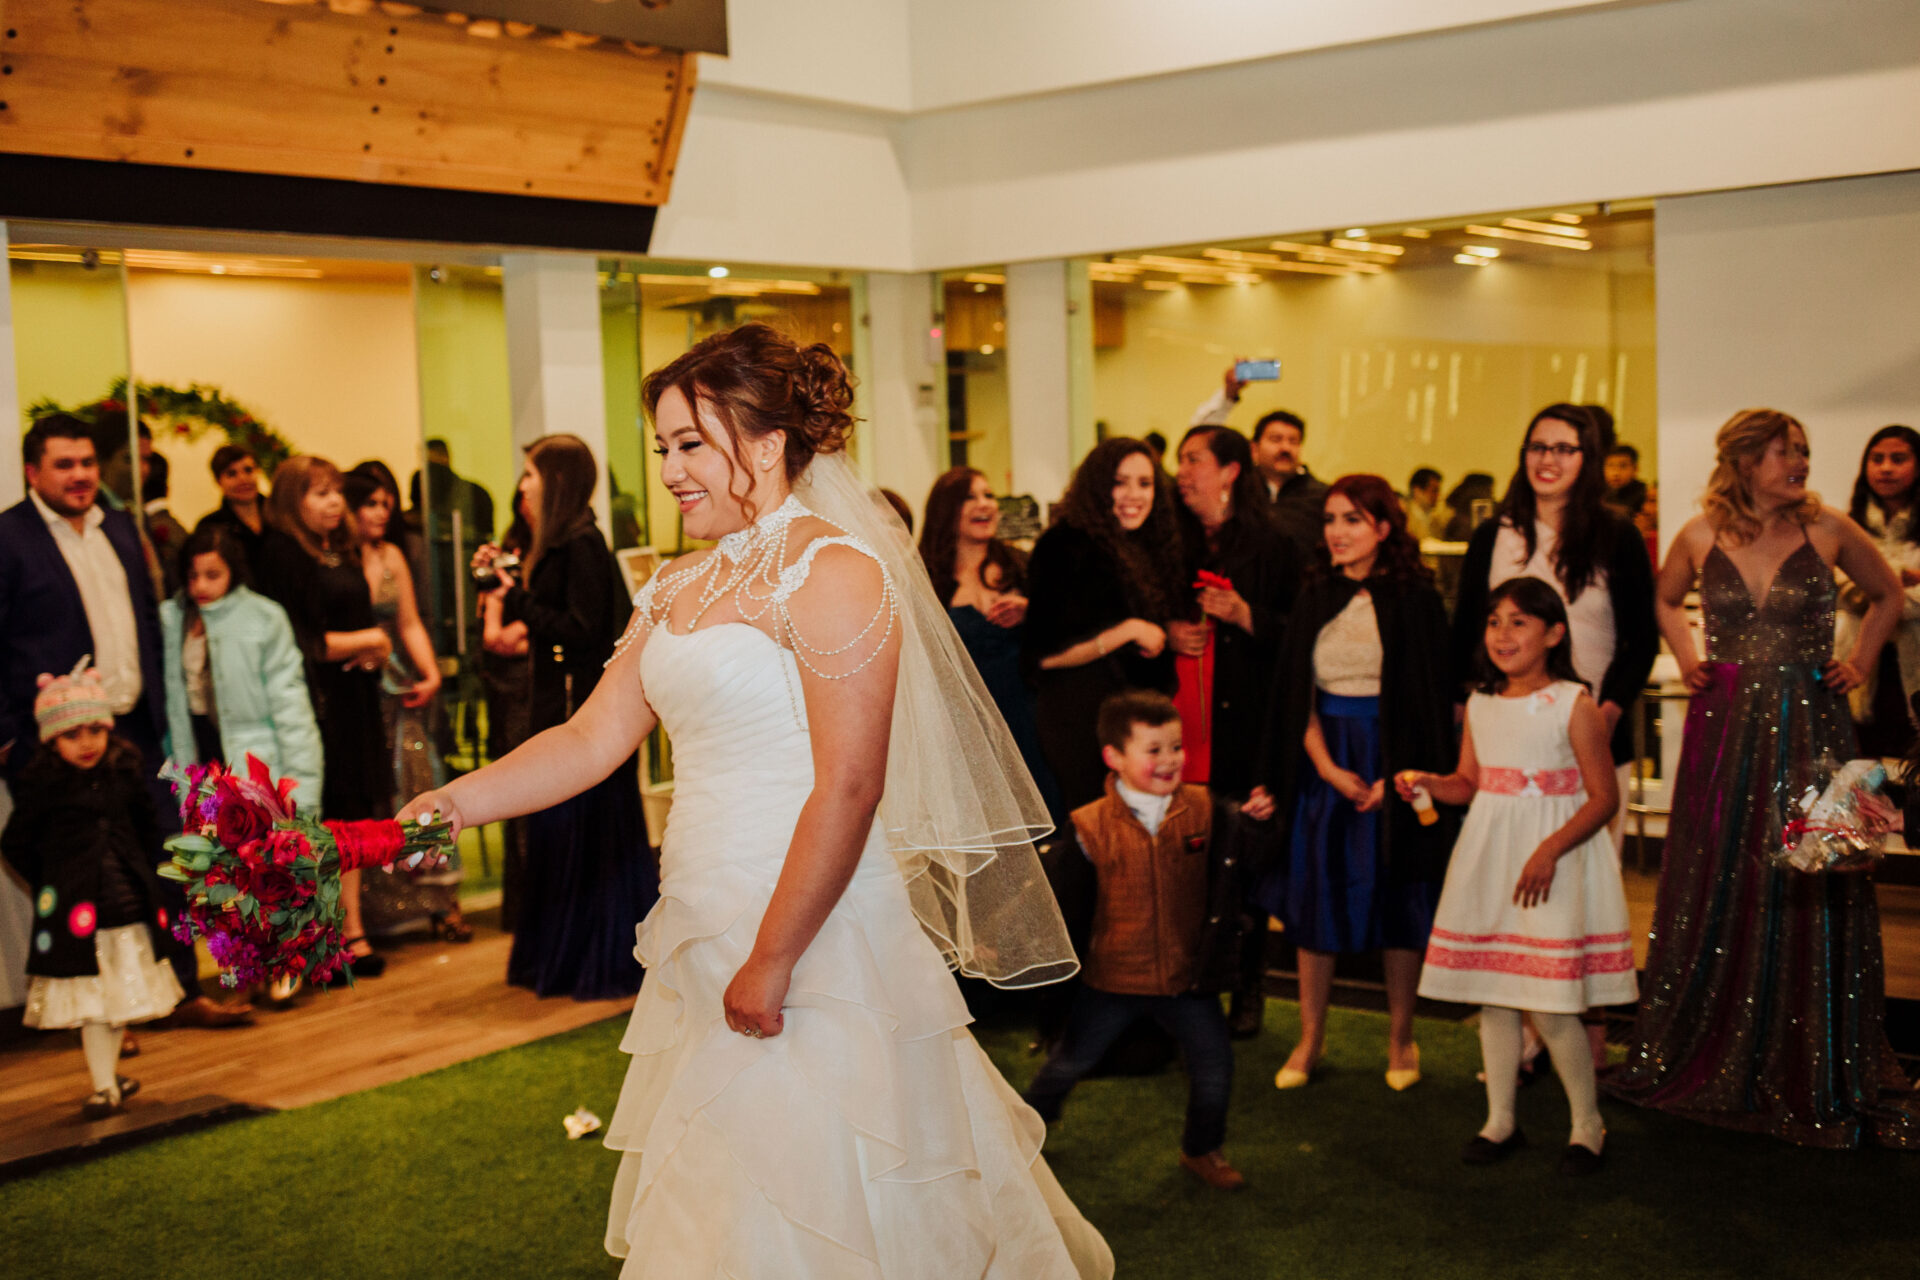 javier_noriega_fotografo_bodas_gaviones_zacatecas_wedding_photographer34